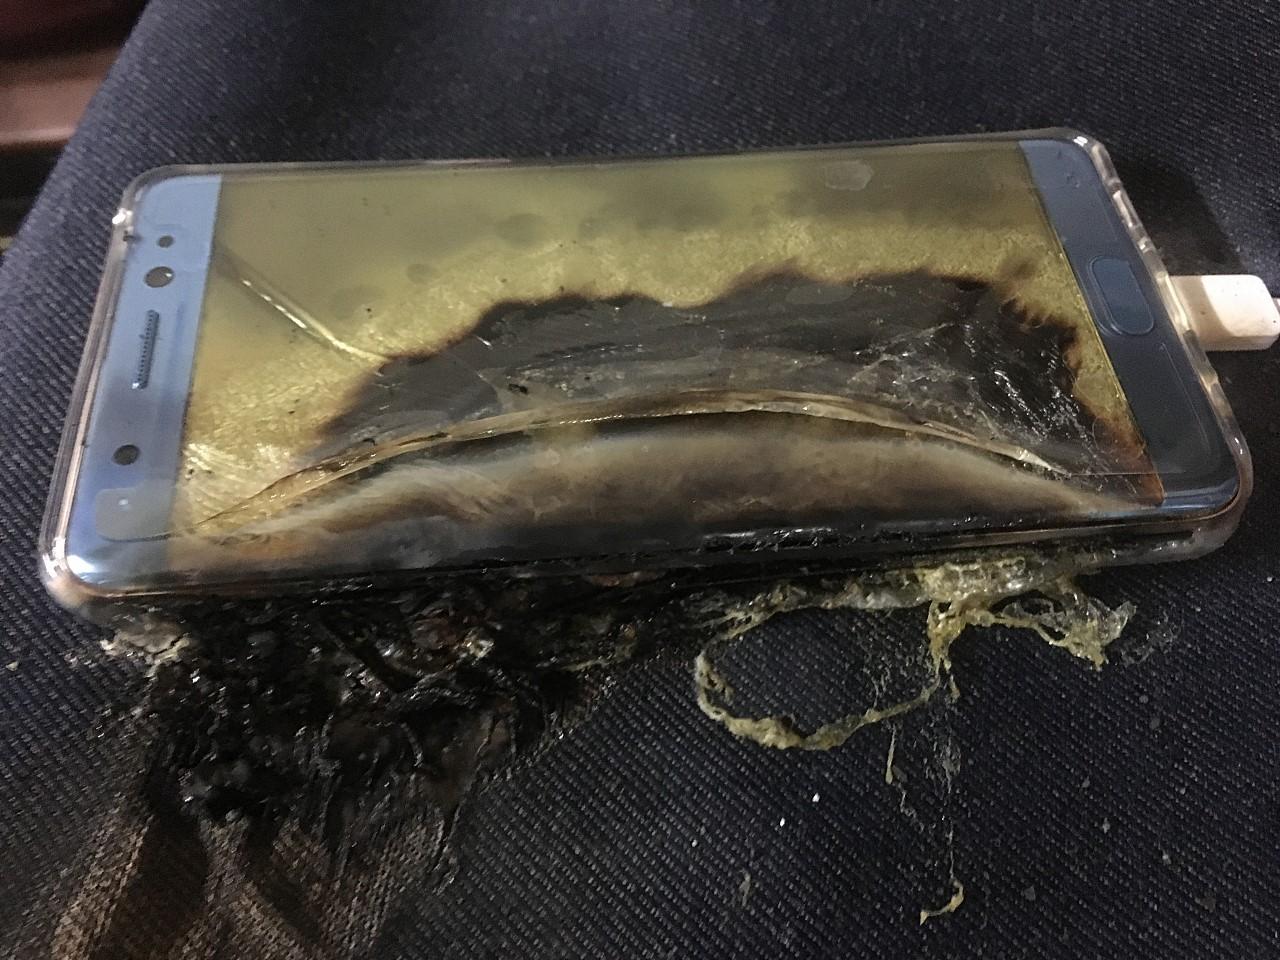 Galaxy-note-7 -phones-catch-fire